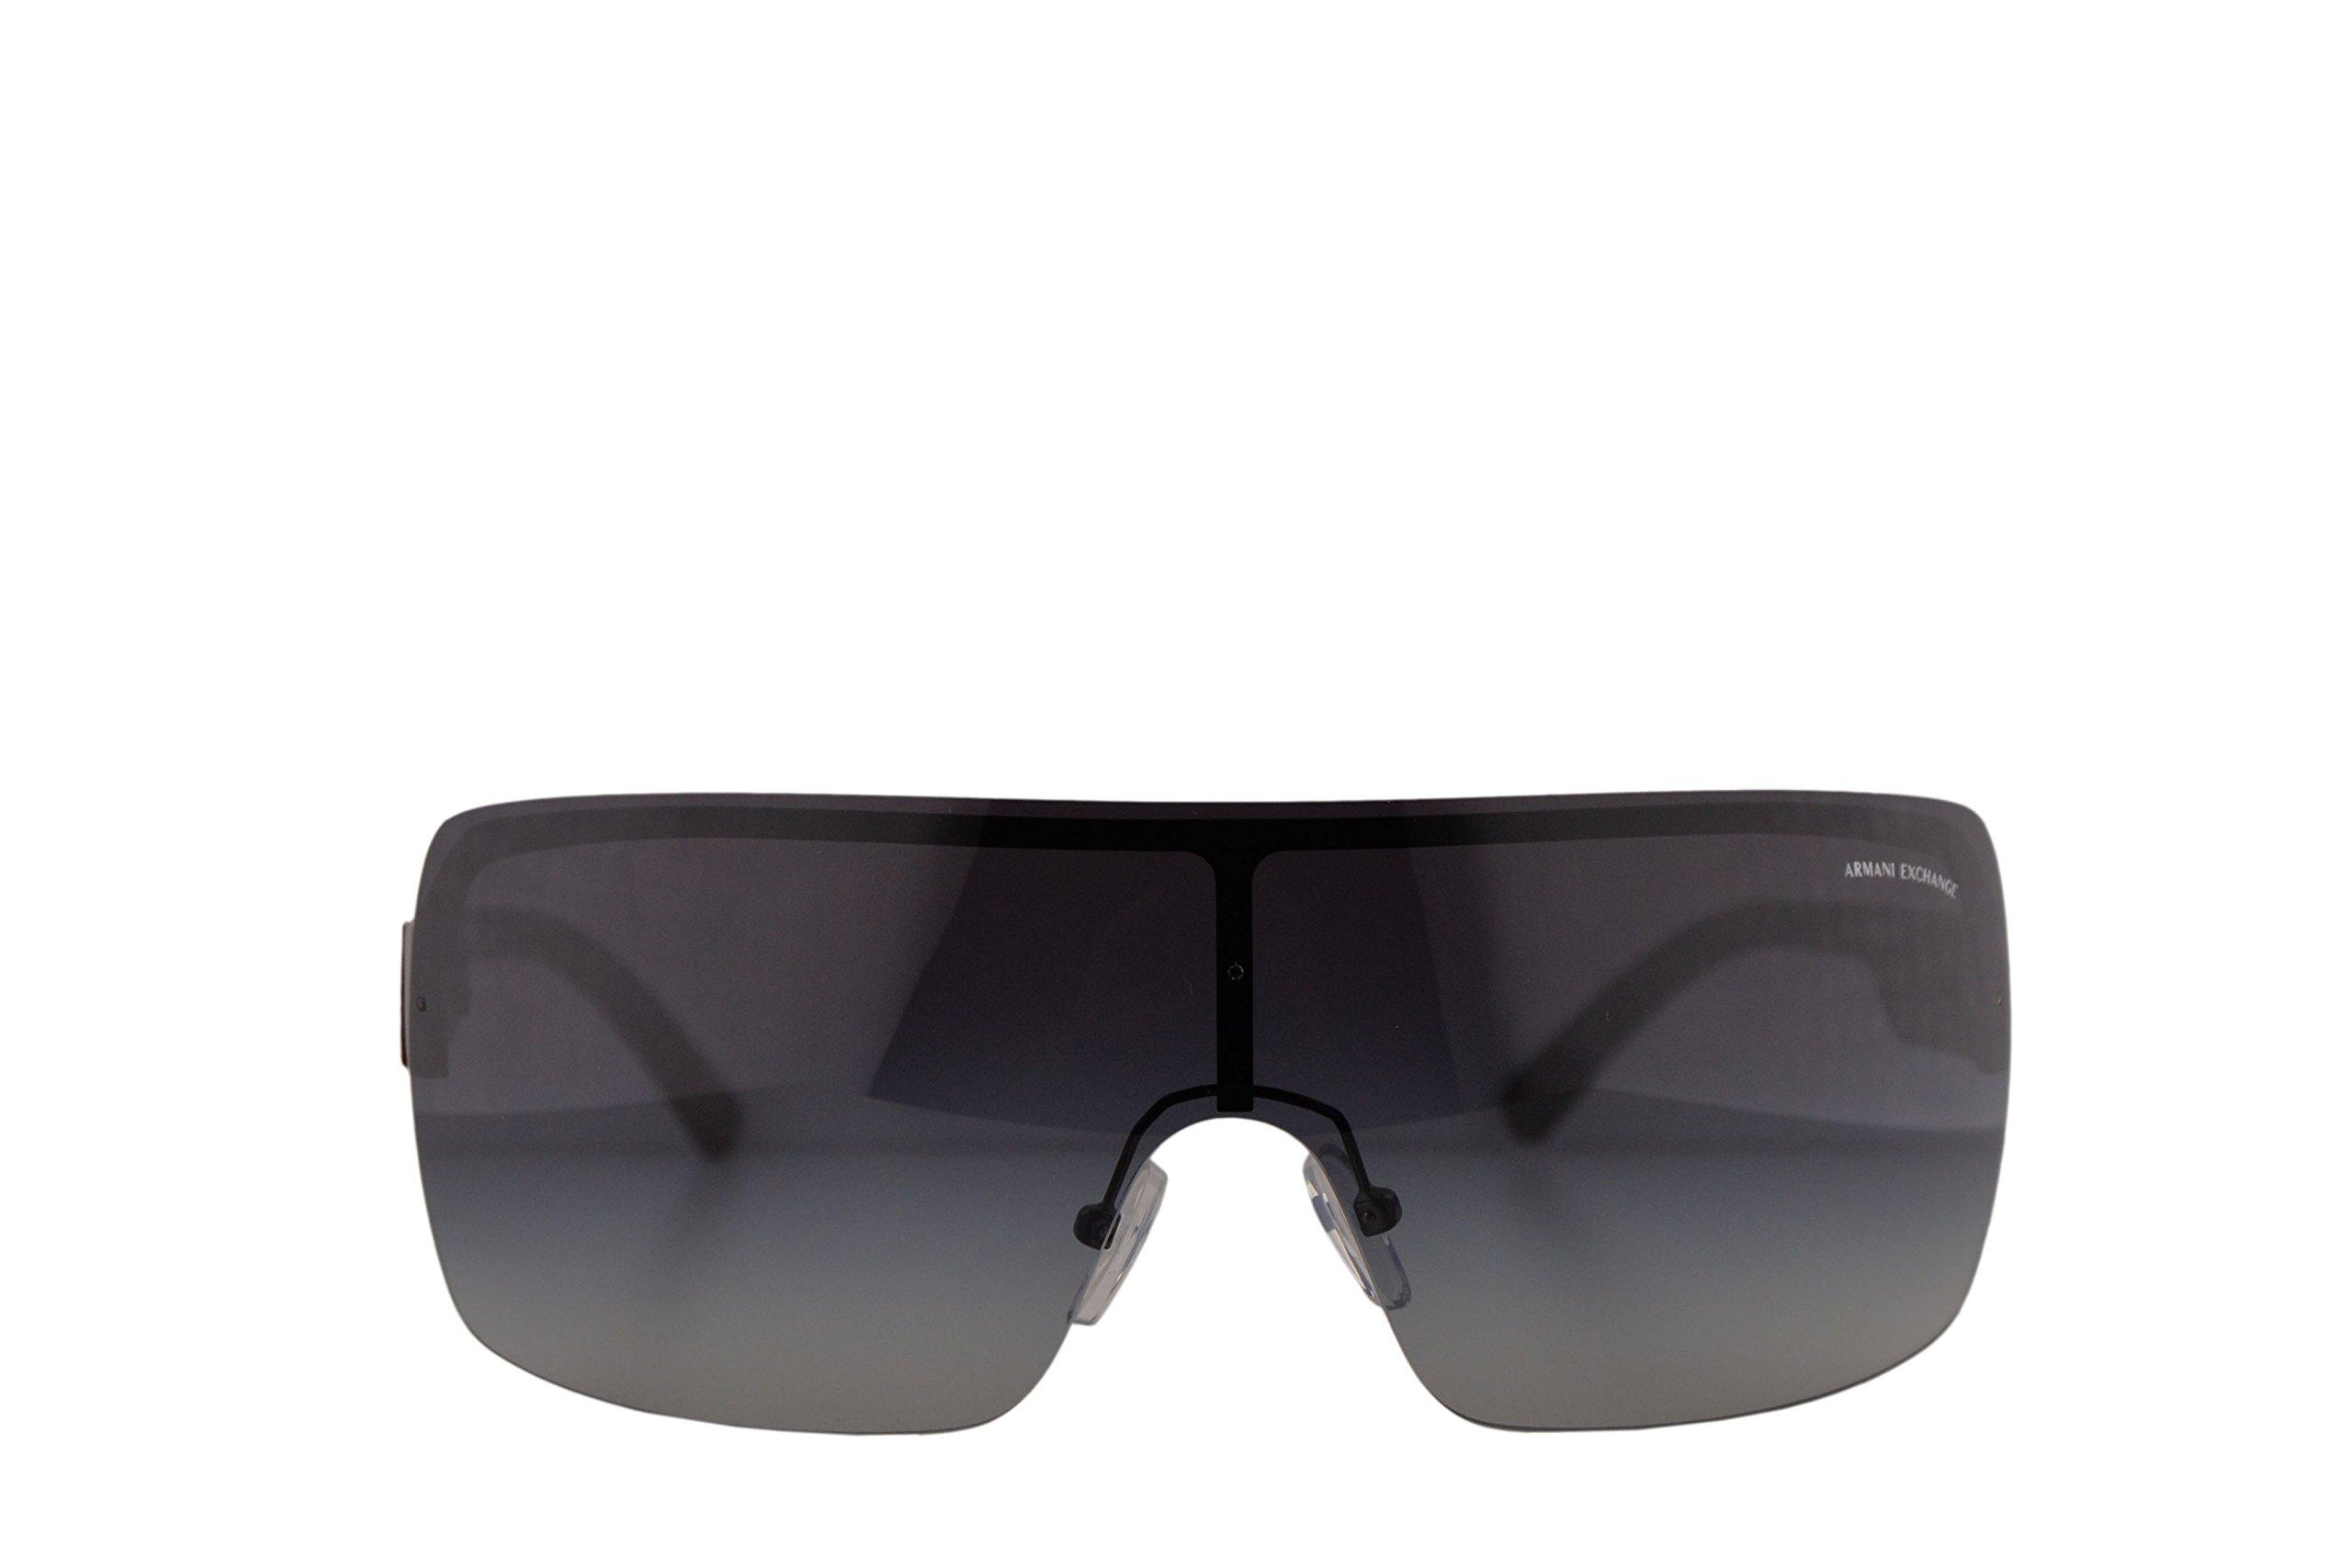 Armani Exchange AX2024S Sunglasses Matte Gunmetal w/Grey Gradient Lens 35mm 60888G AX2024 AX 2024 AX 2024S